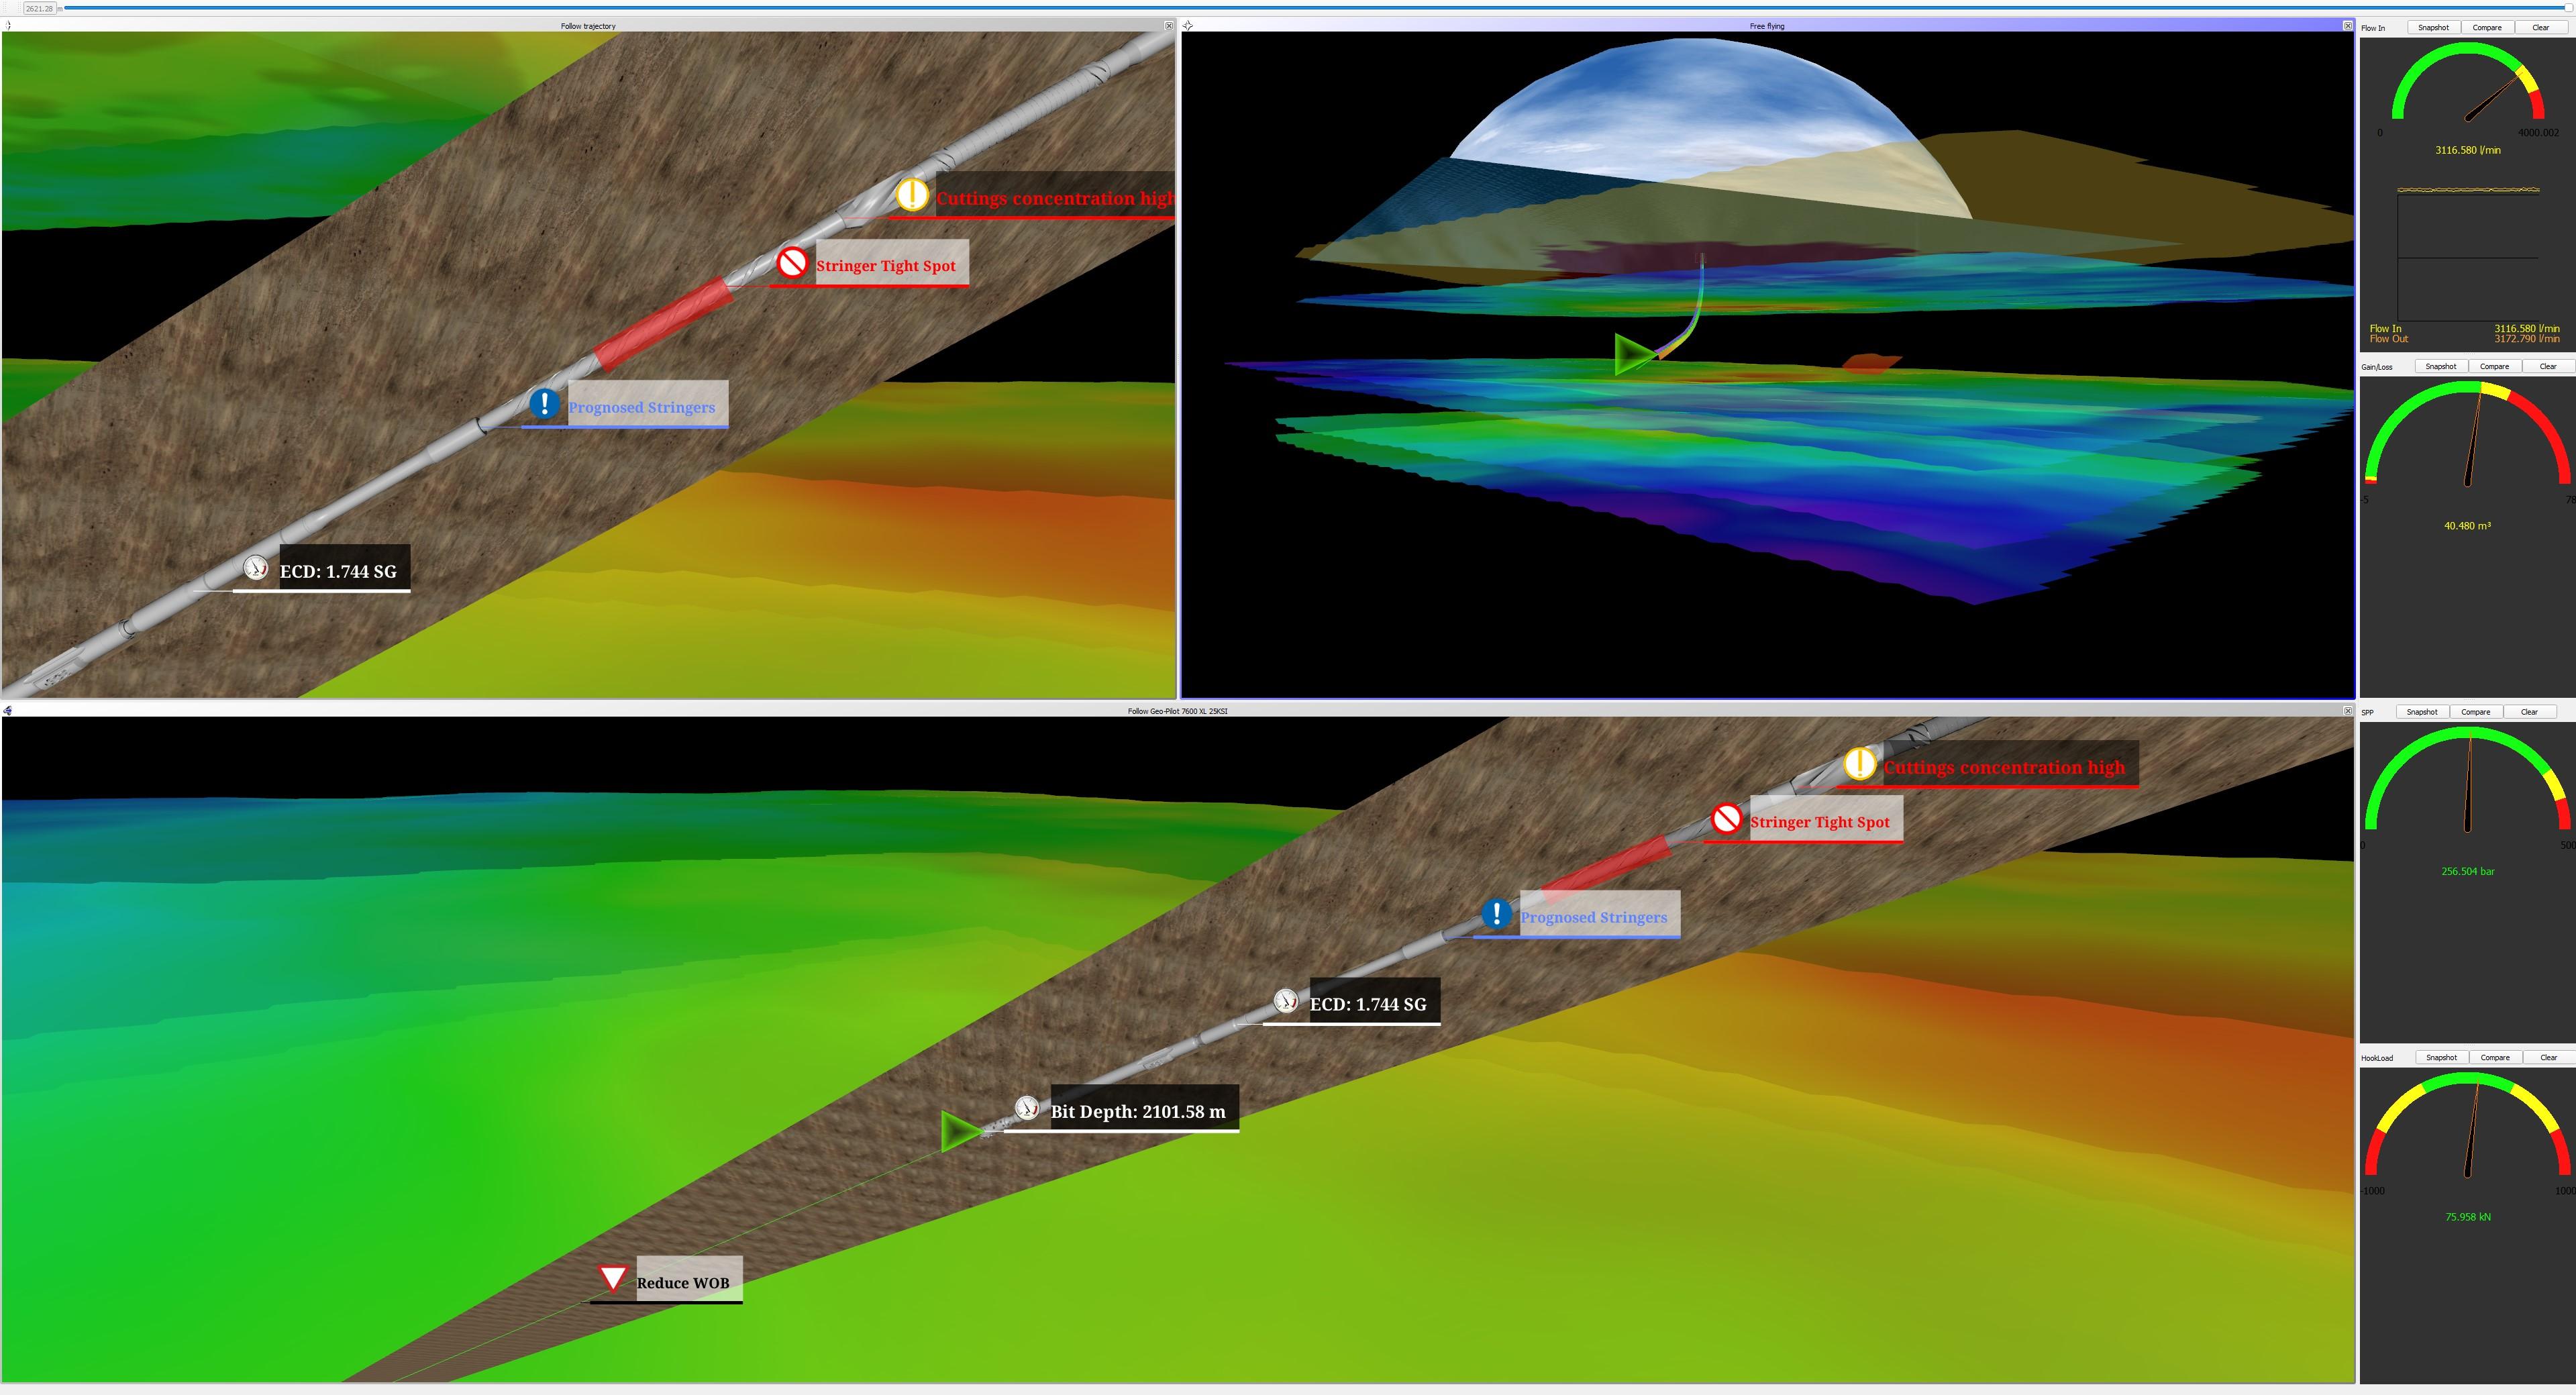 Aritificial Intelligence and Predictive Analytics improving drilling performancve